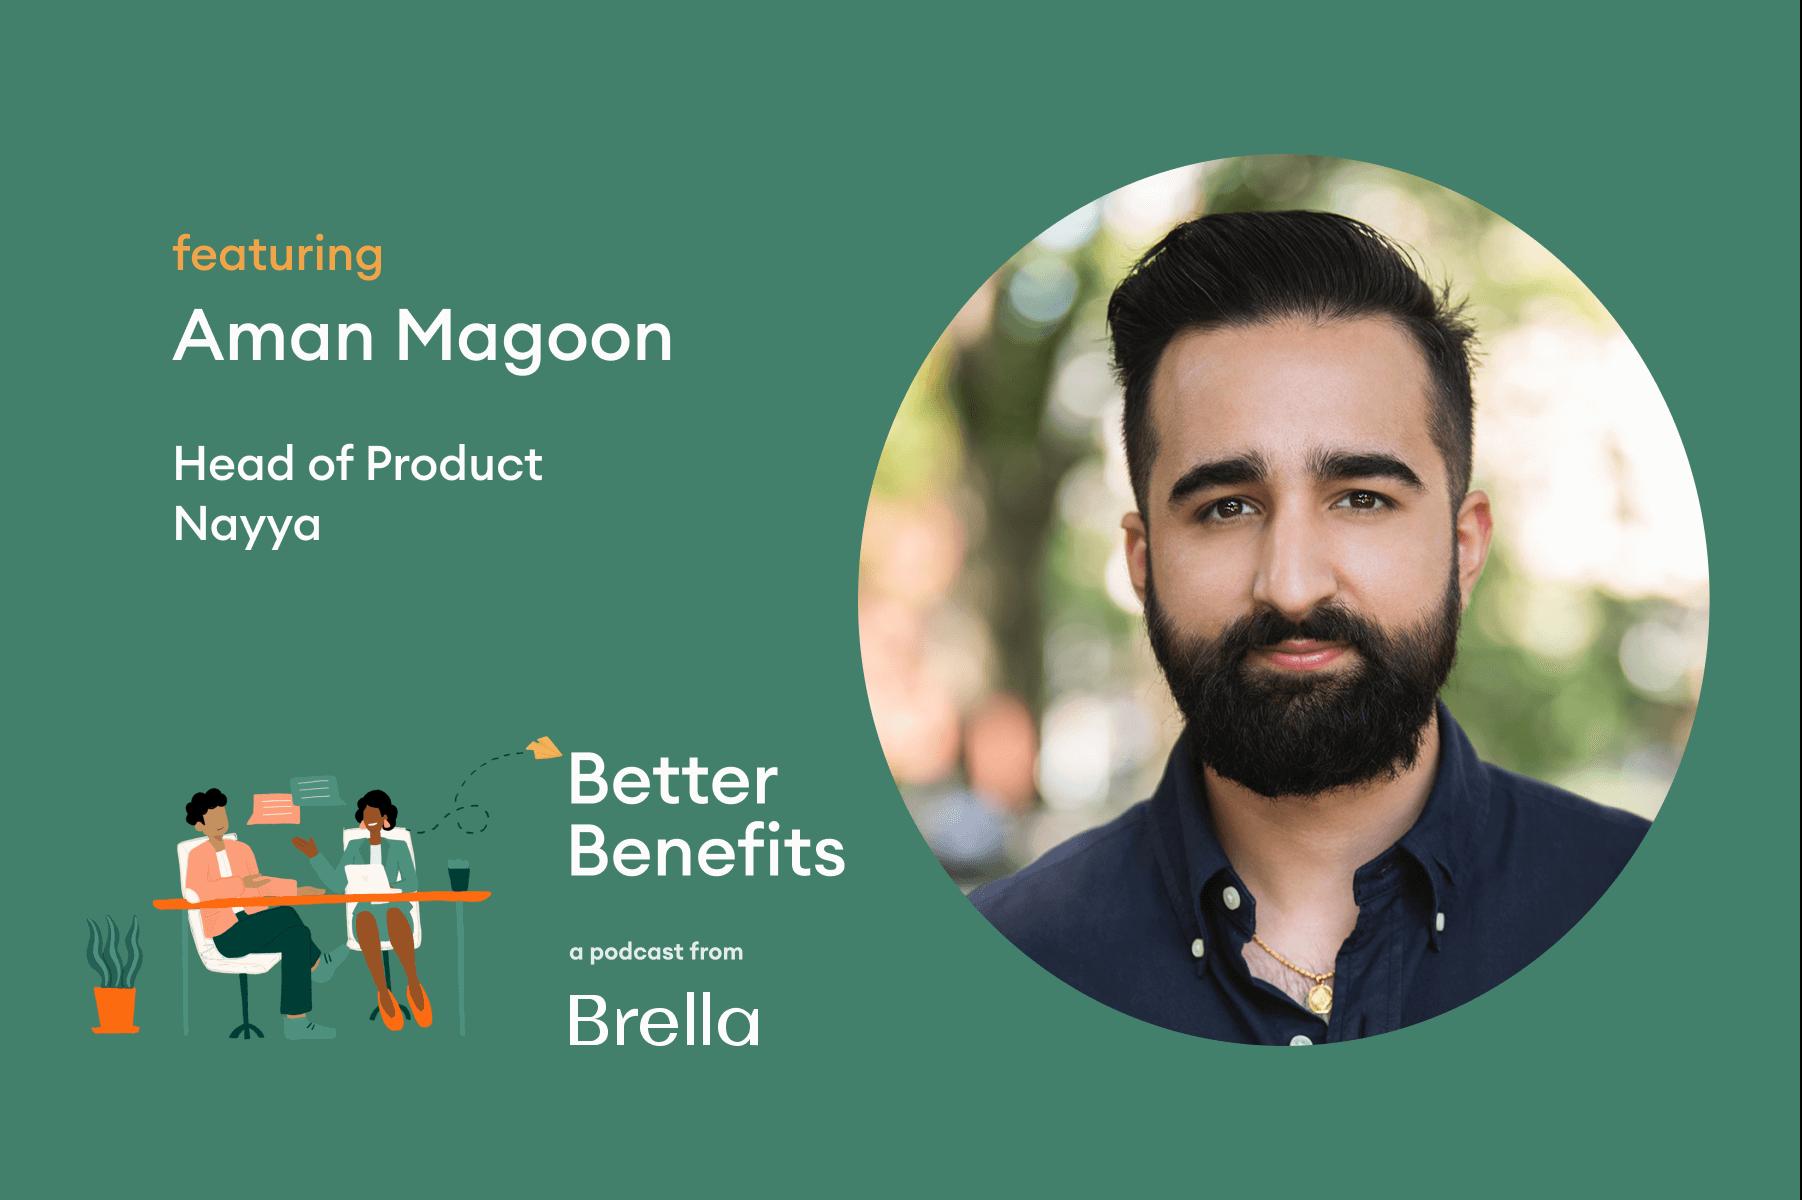 Aman Magoon on Better Benefits Podcast